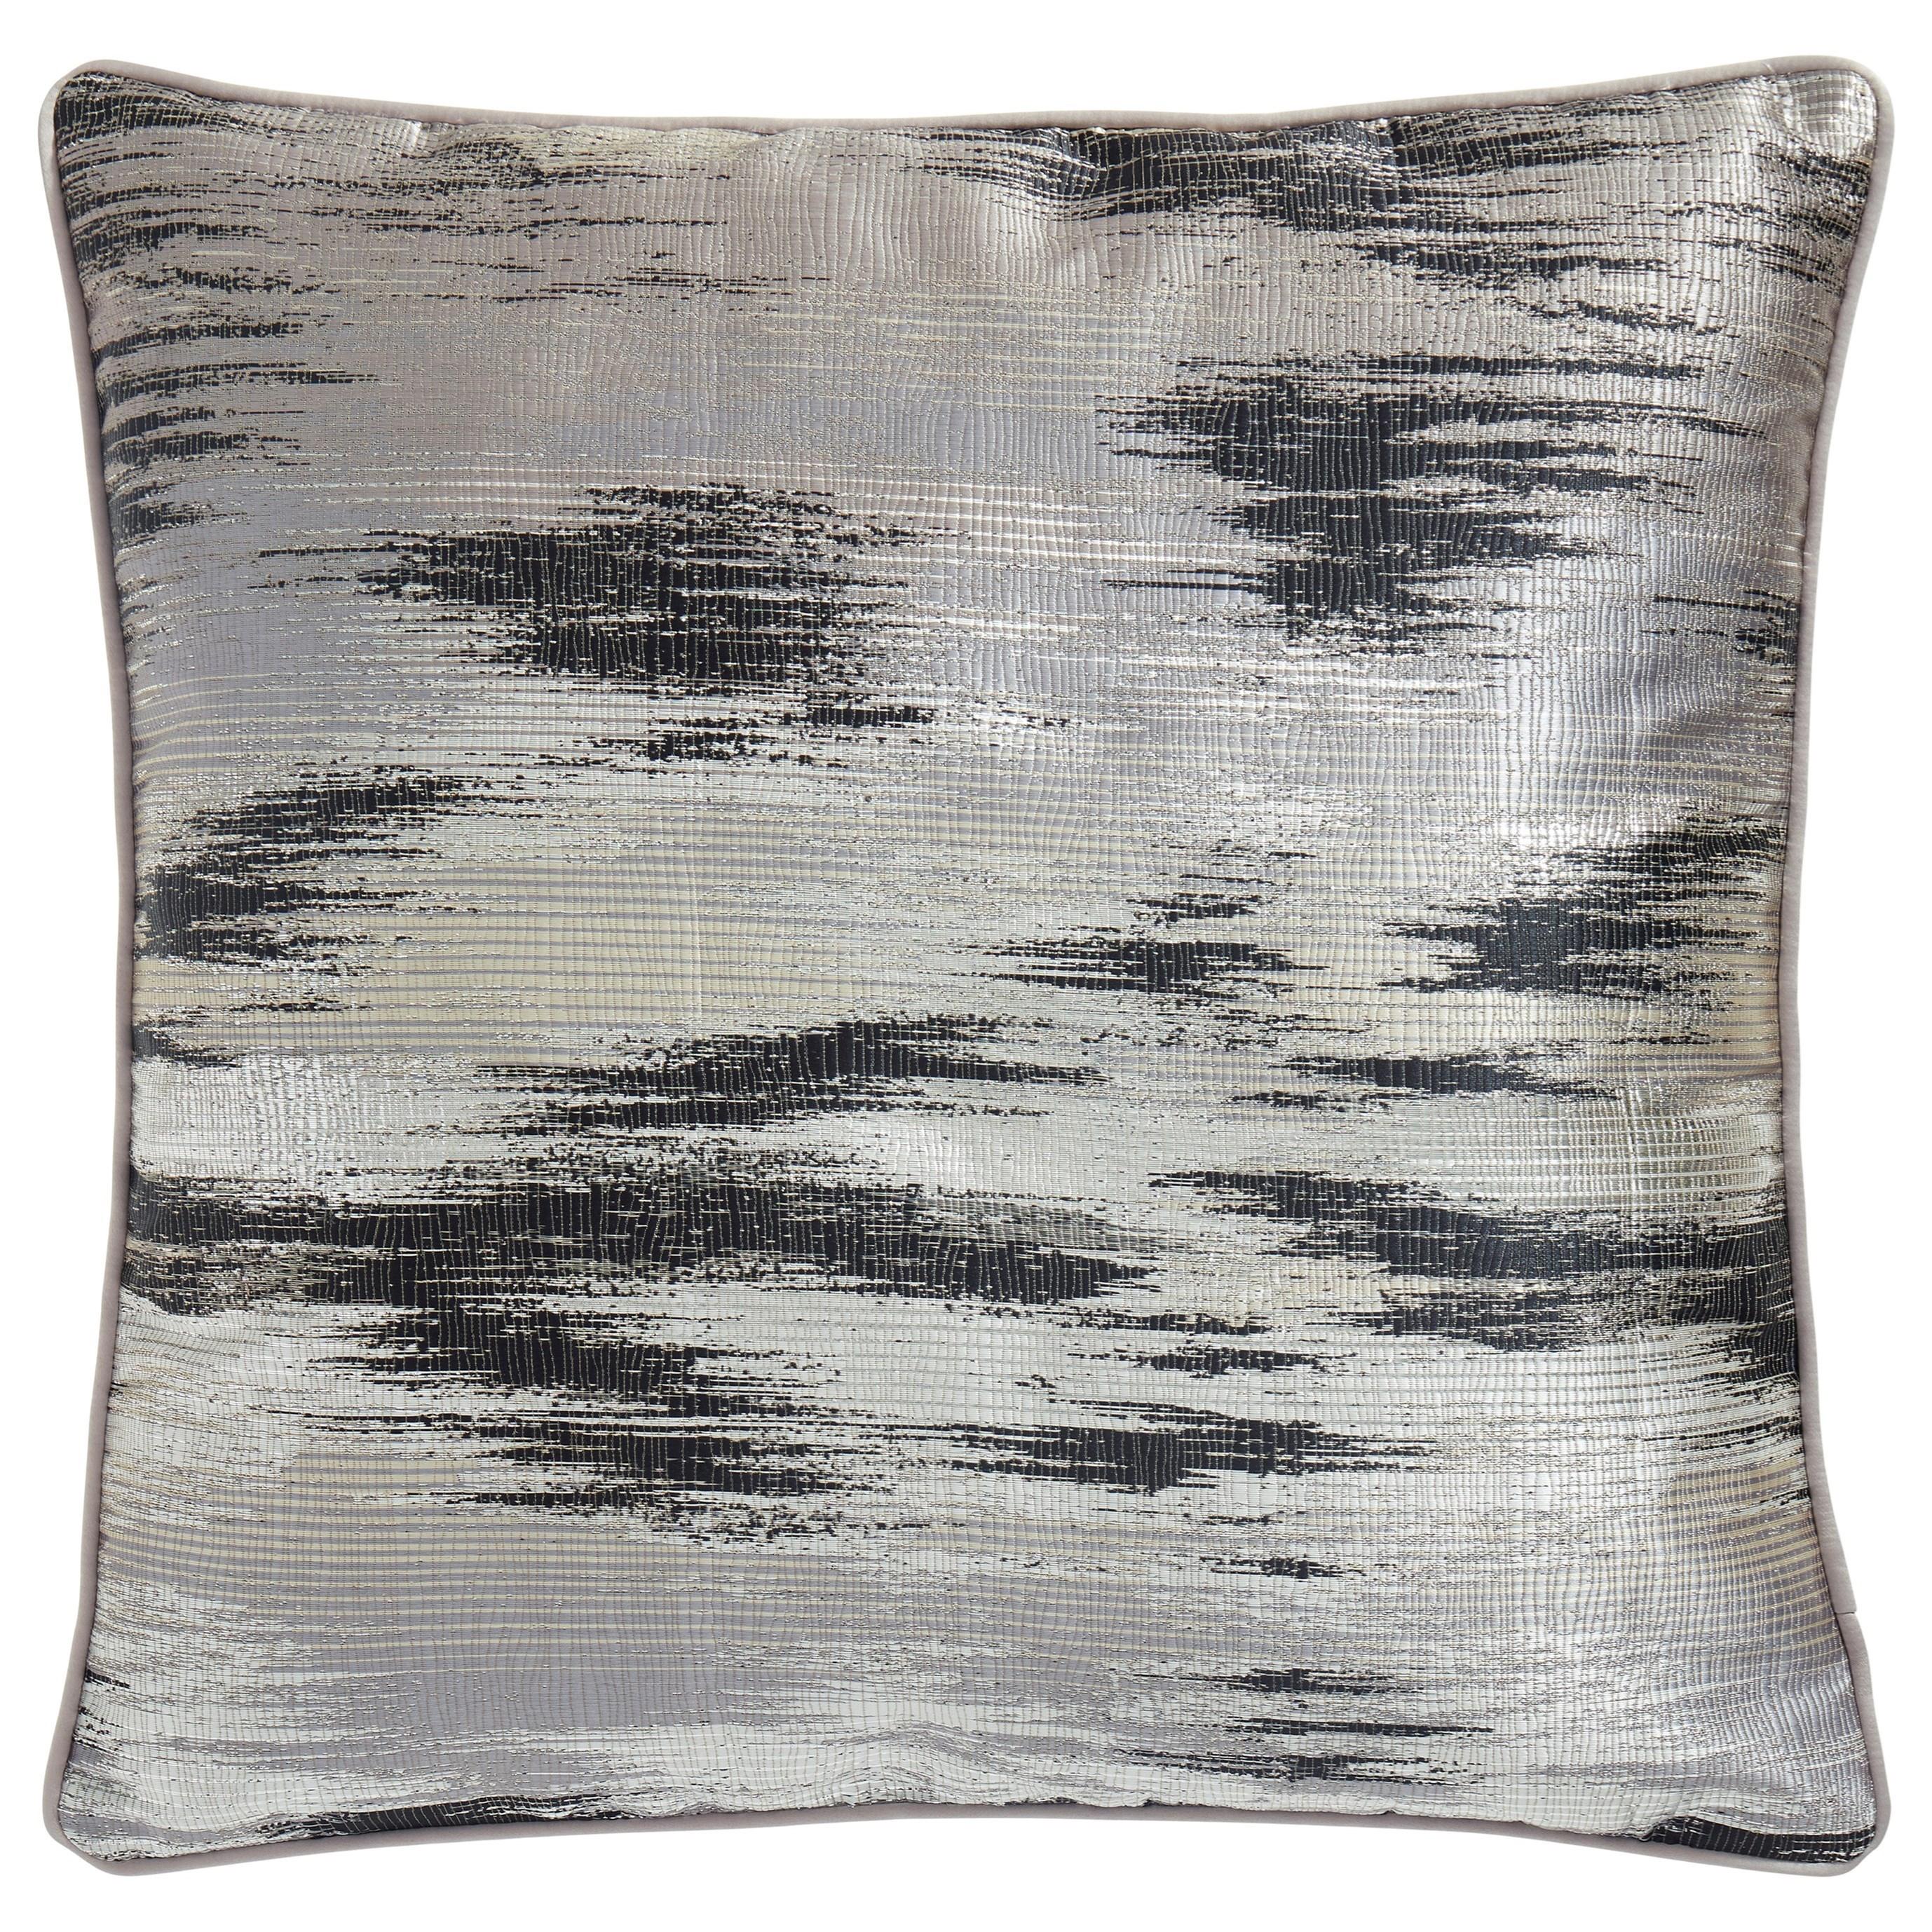 Pillows Martillo Silver/Black Pillow by Signature Design by Ashley at Dream Home Interiors